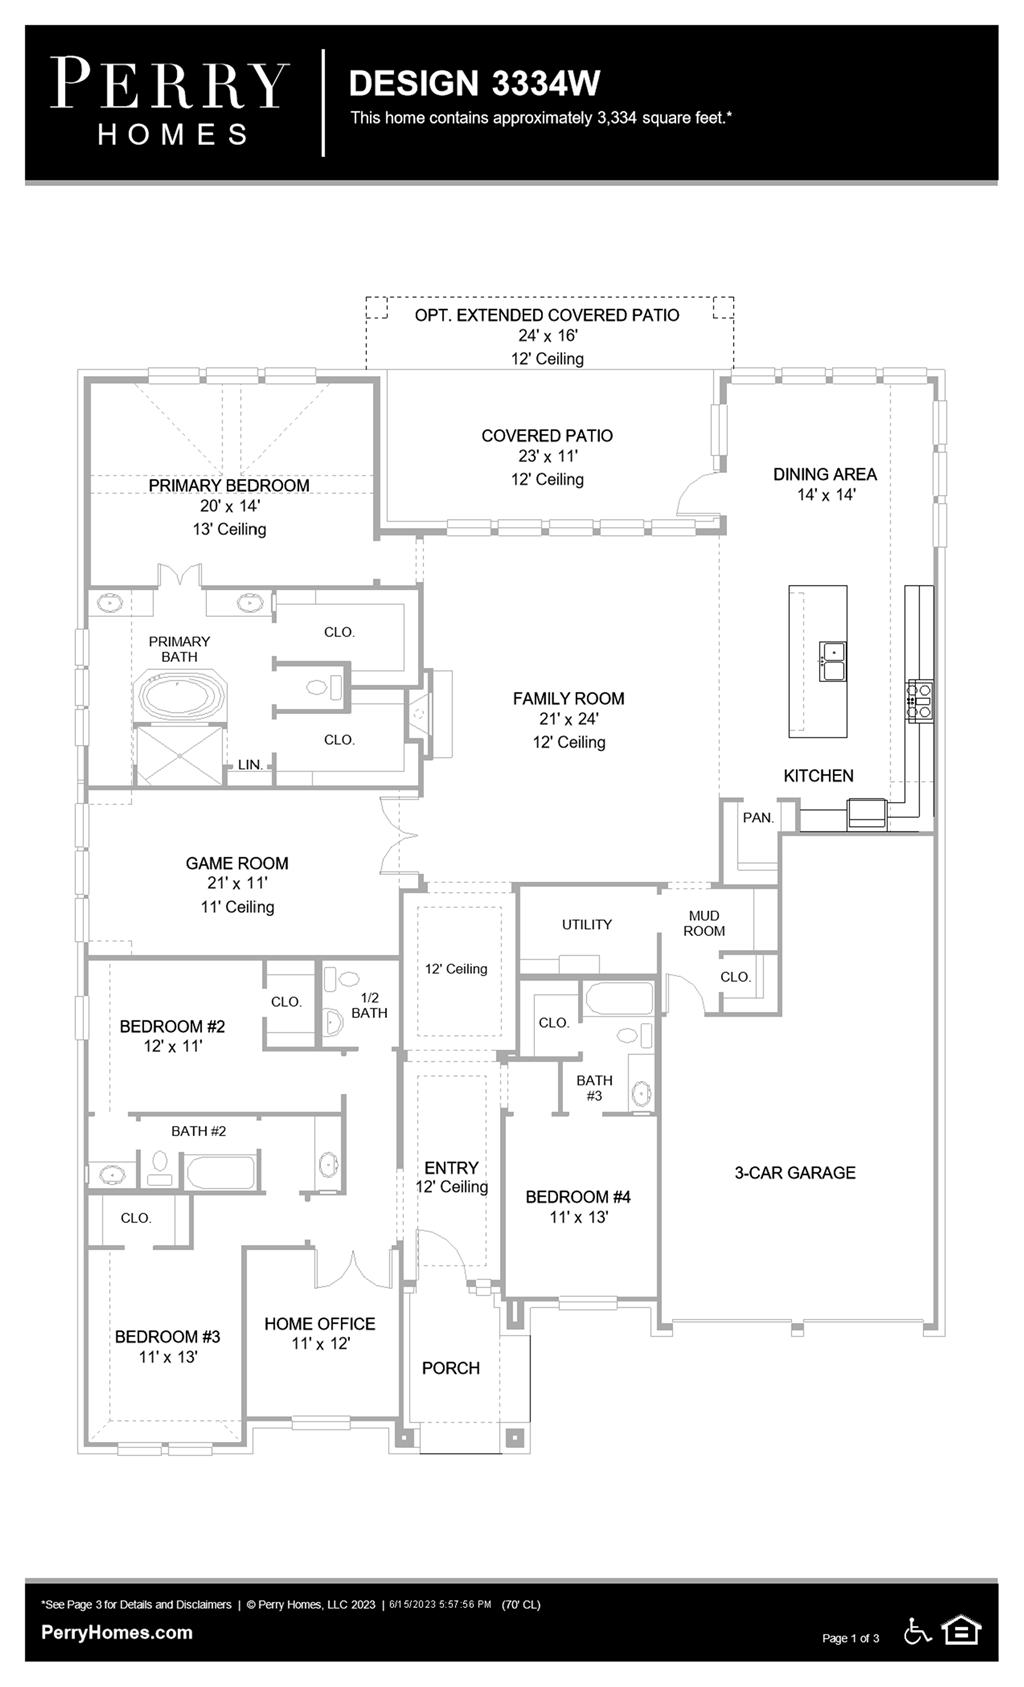 Floor Plan for 3334W